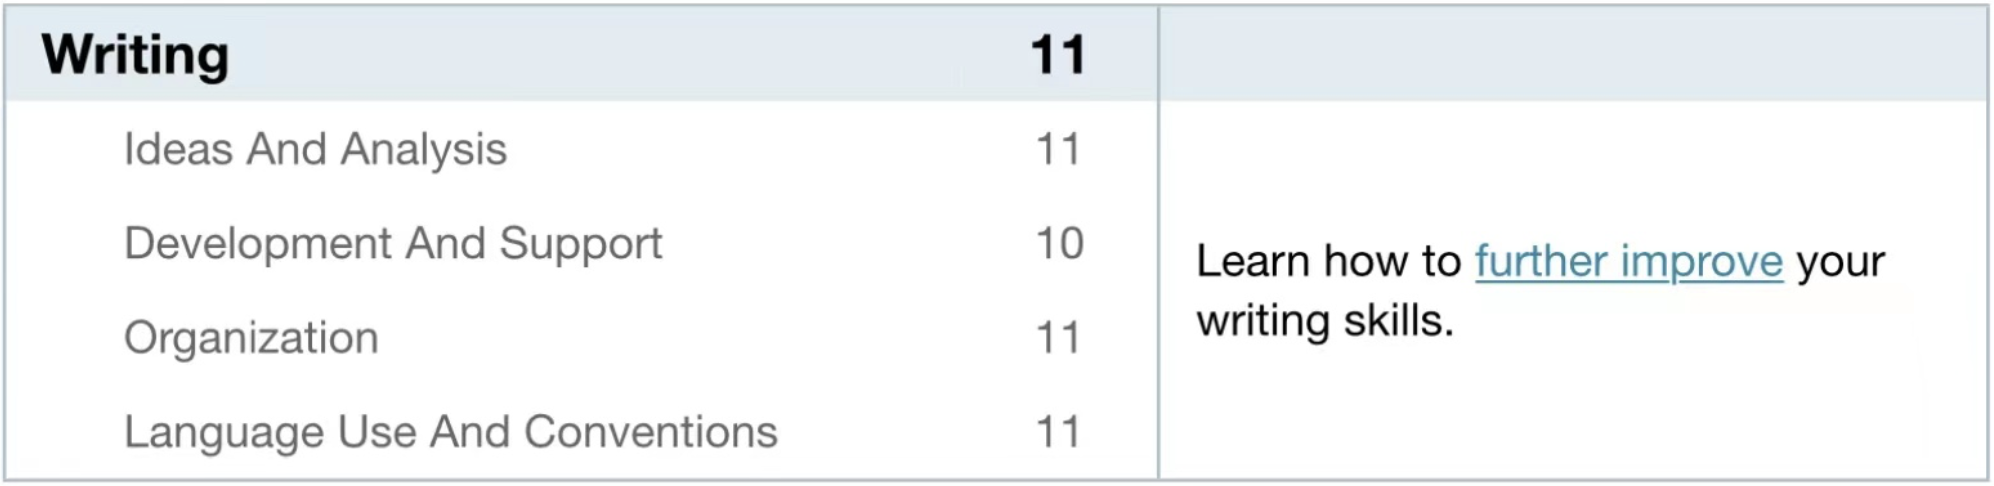 ACT写作首考就拿到了11分,我是怎么做到的?-ACT高分写作备考经验分享